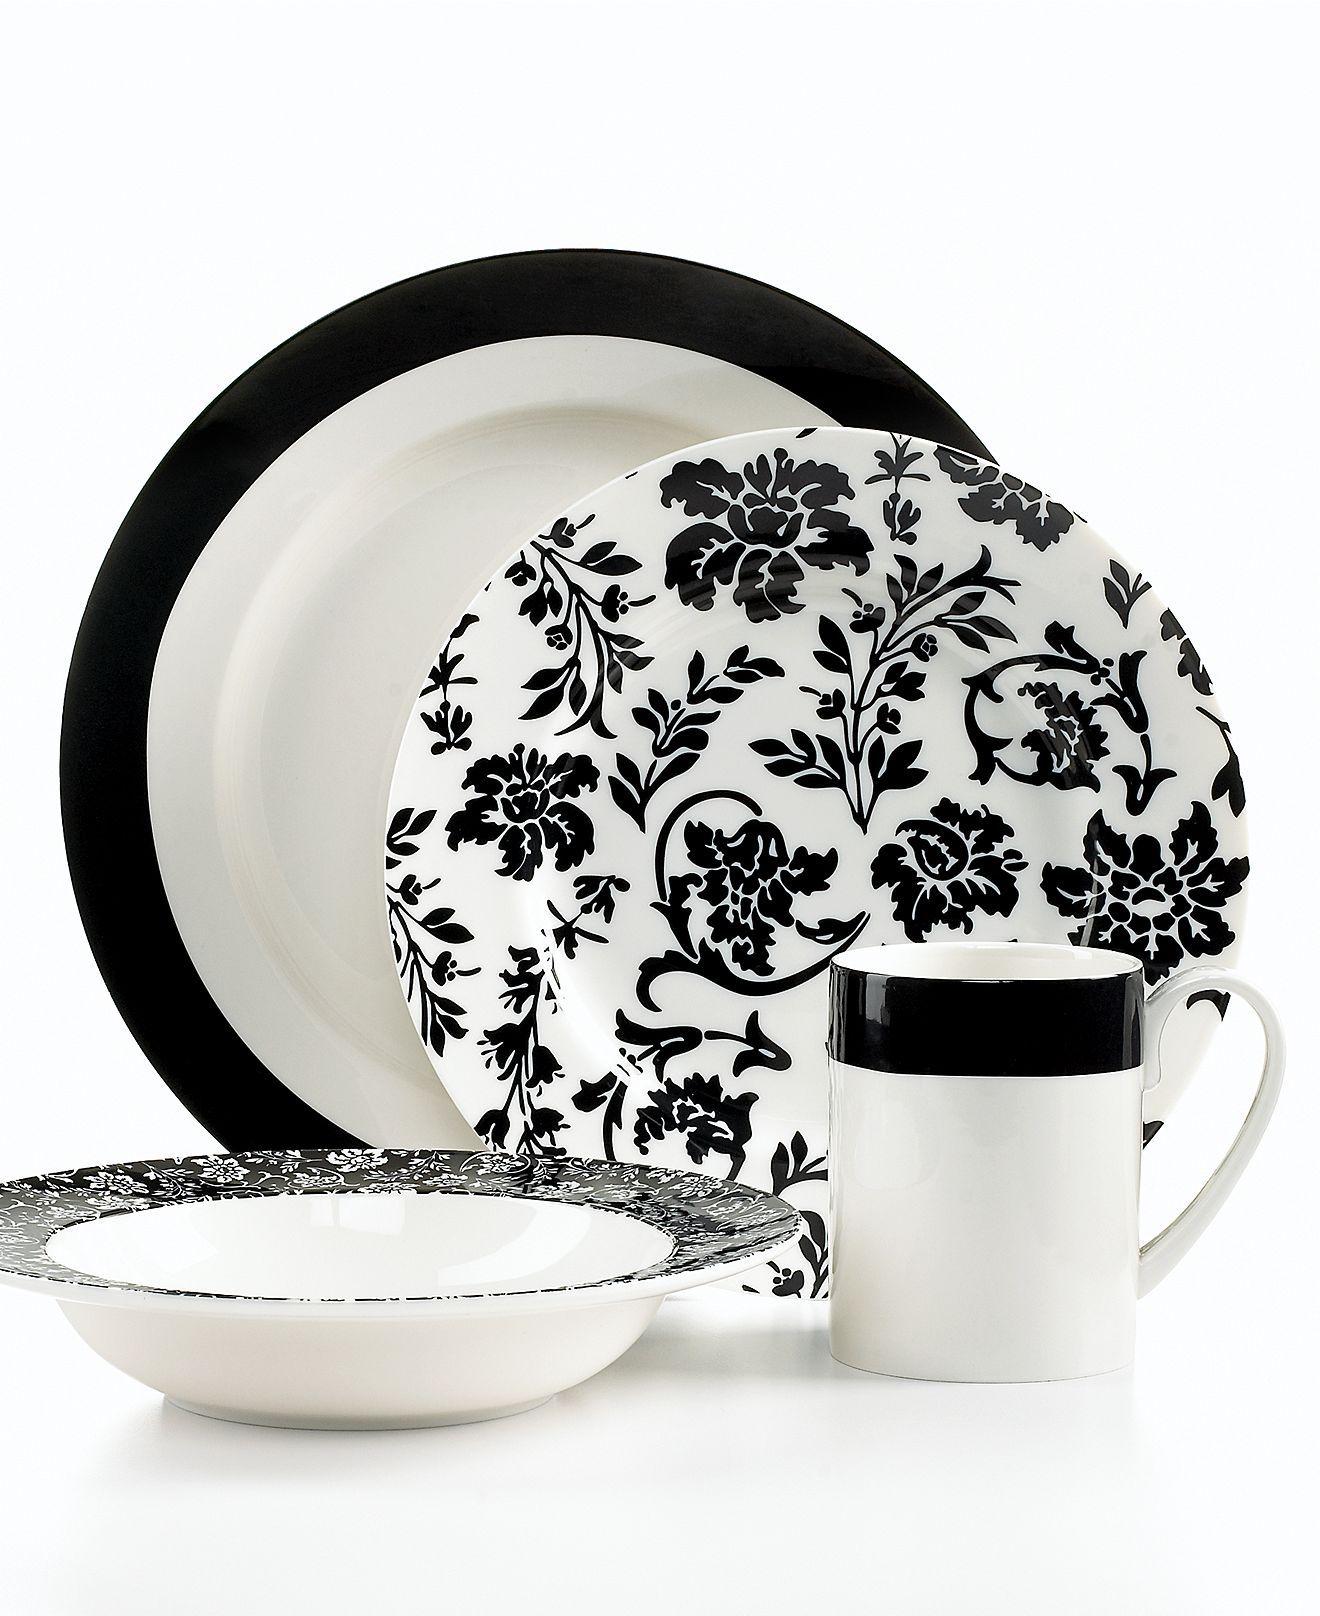 Martha Stewart Collection Dinnerware Geneva Collection Casual